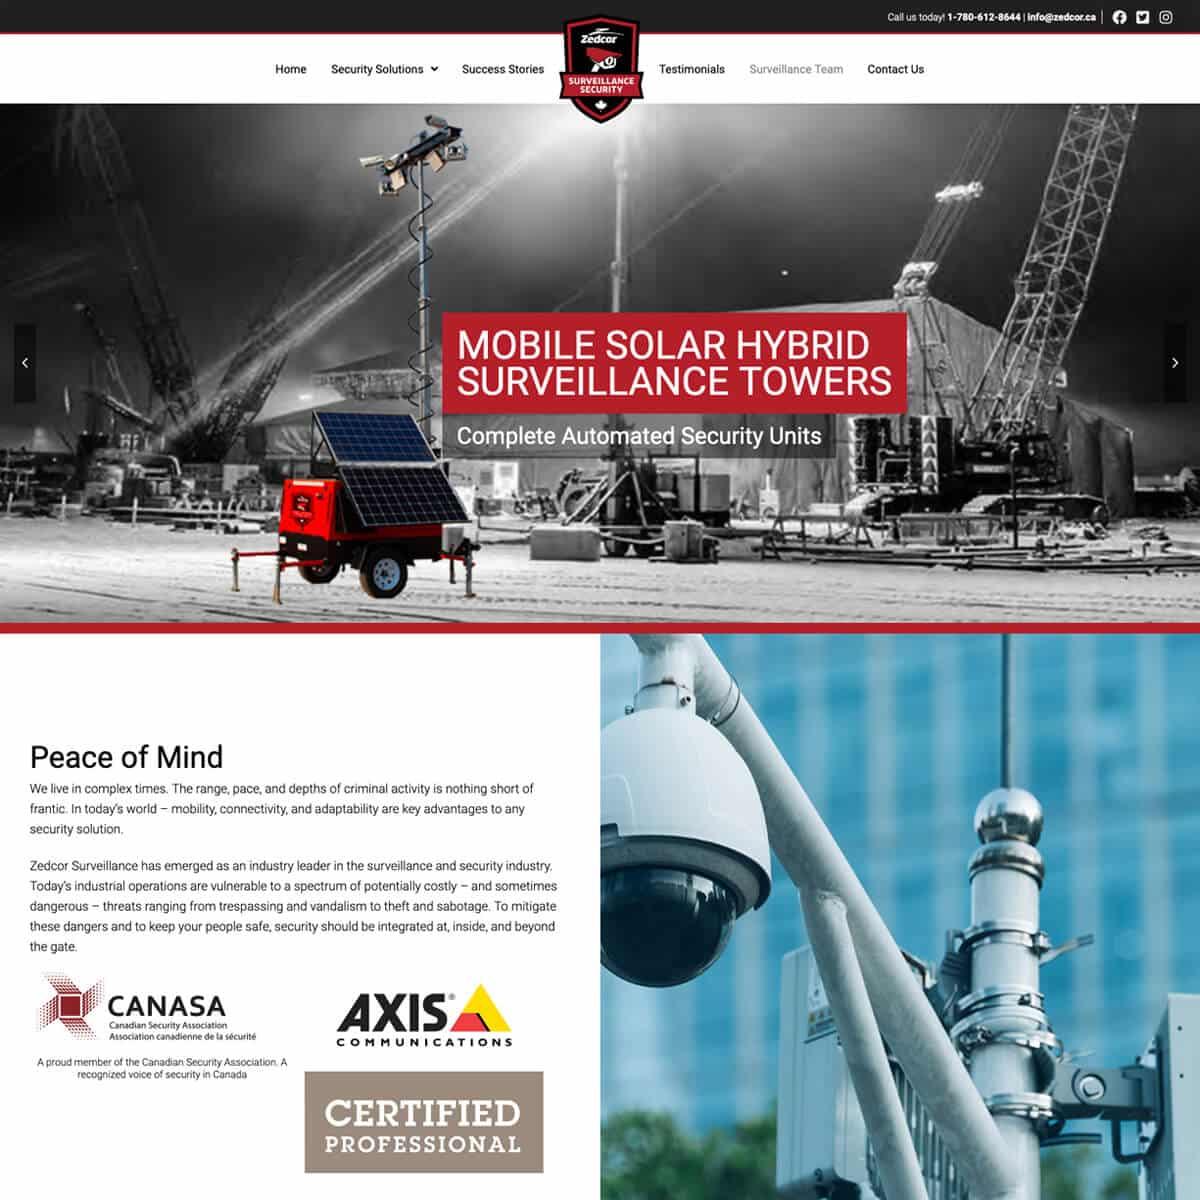 website-design-portfolio-after-zedcor